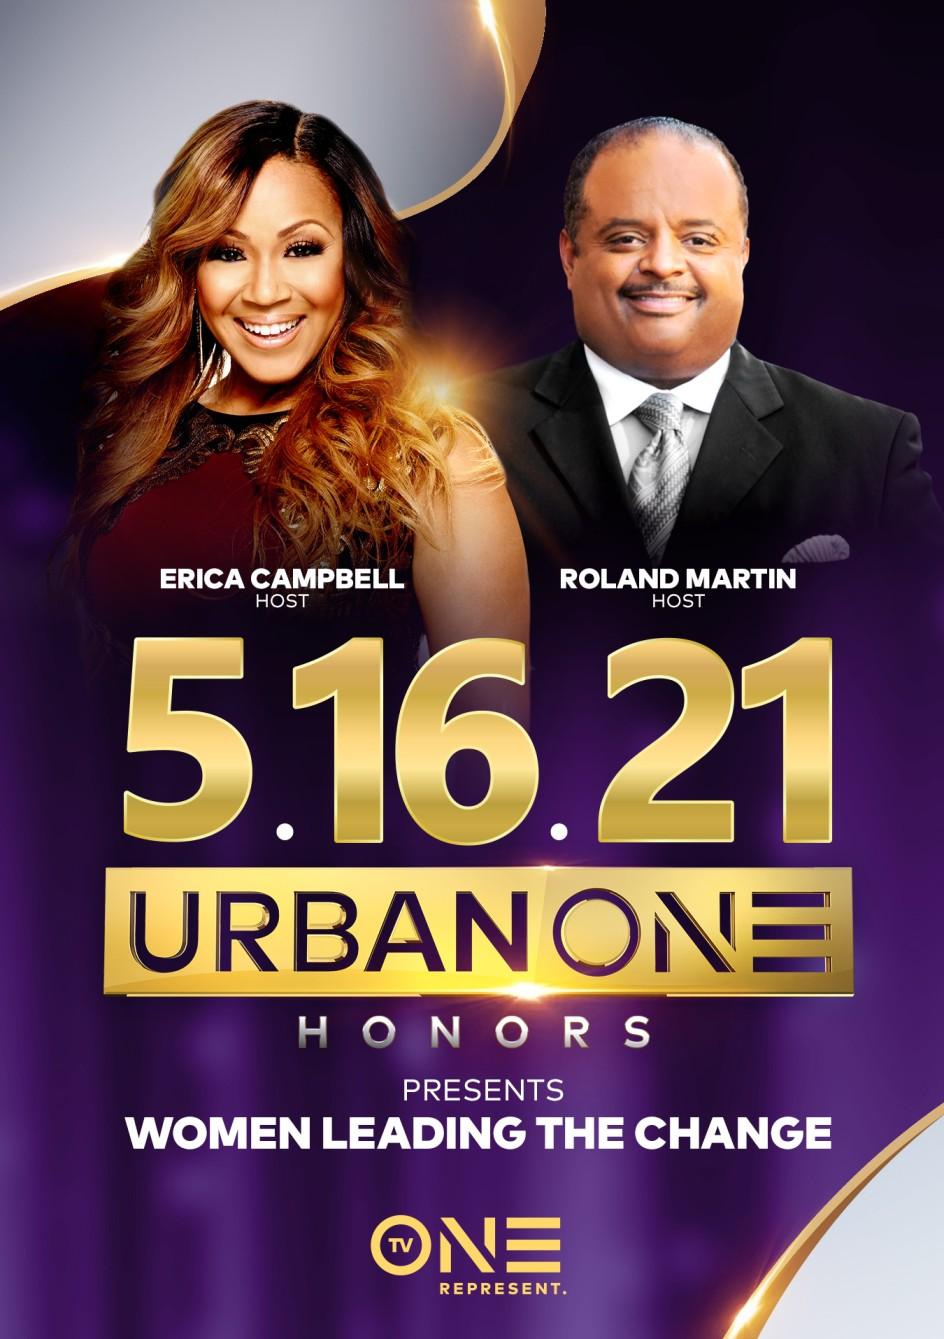 Urban One Honors Date